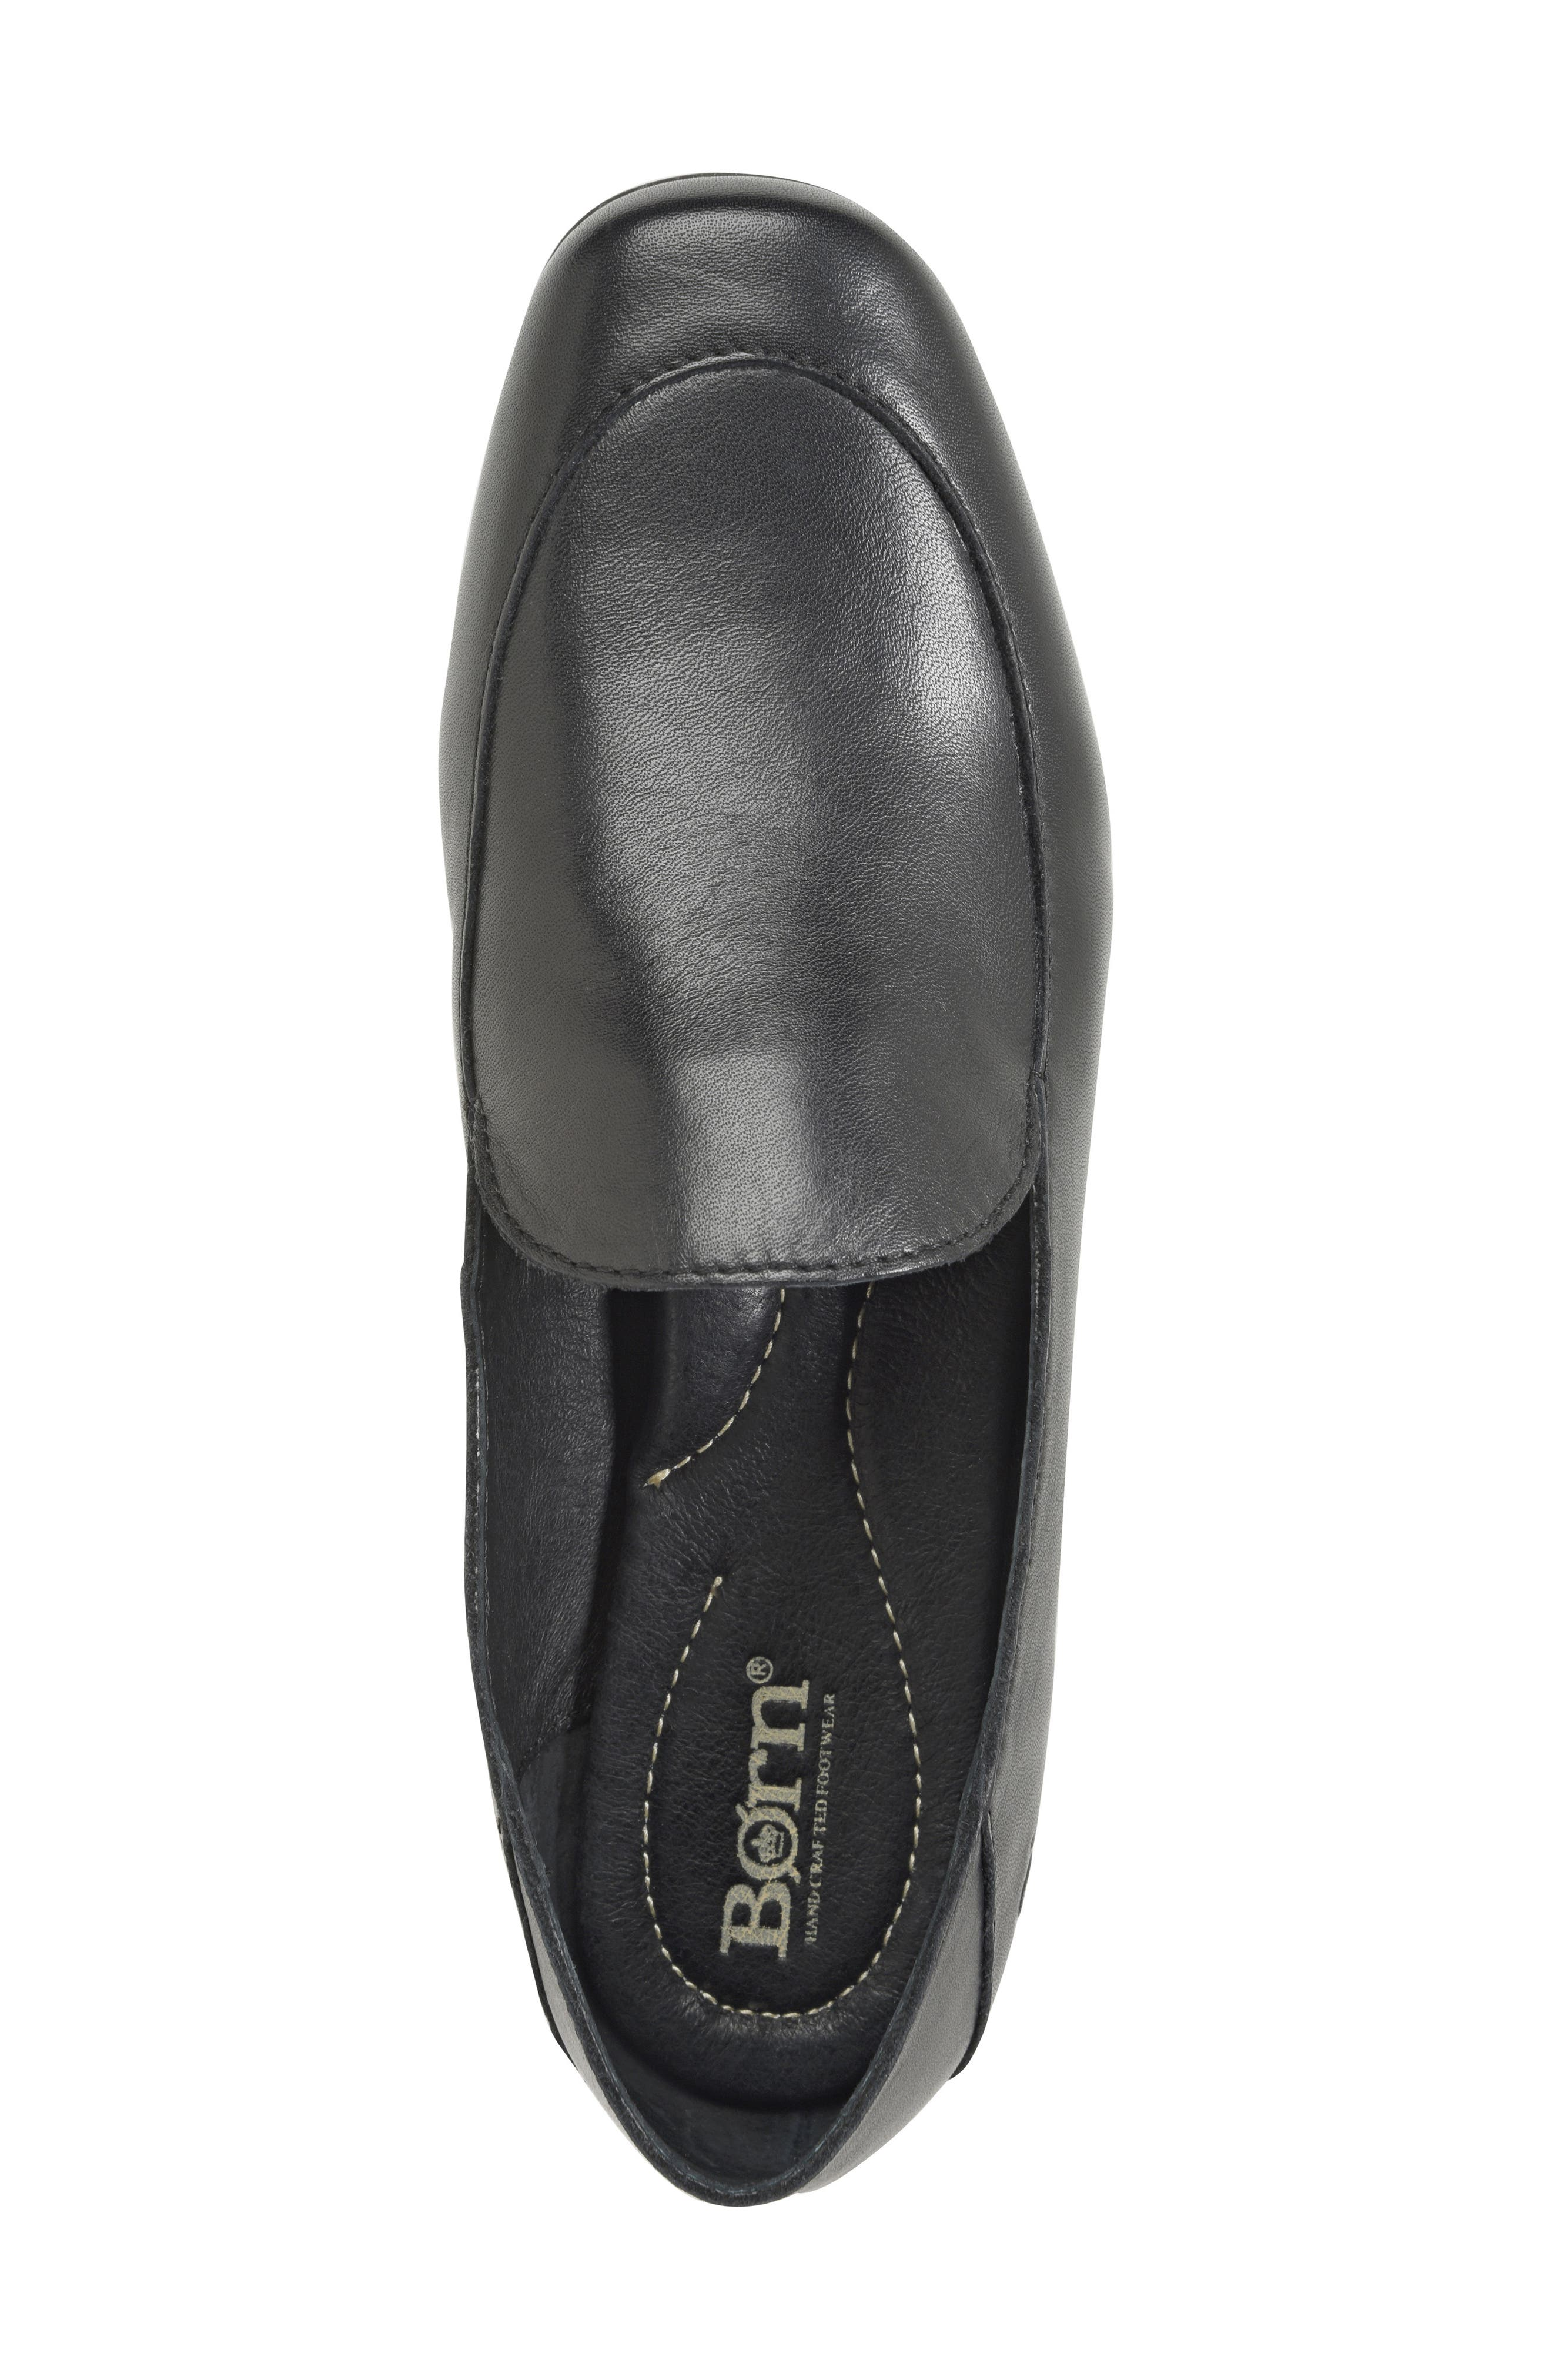 Carib Loafer,                             Alternate thumbnail 5, color,                             Black Leather